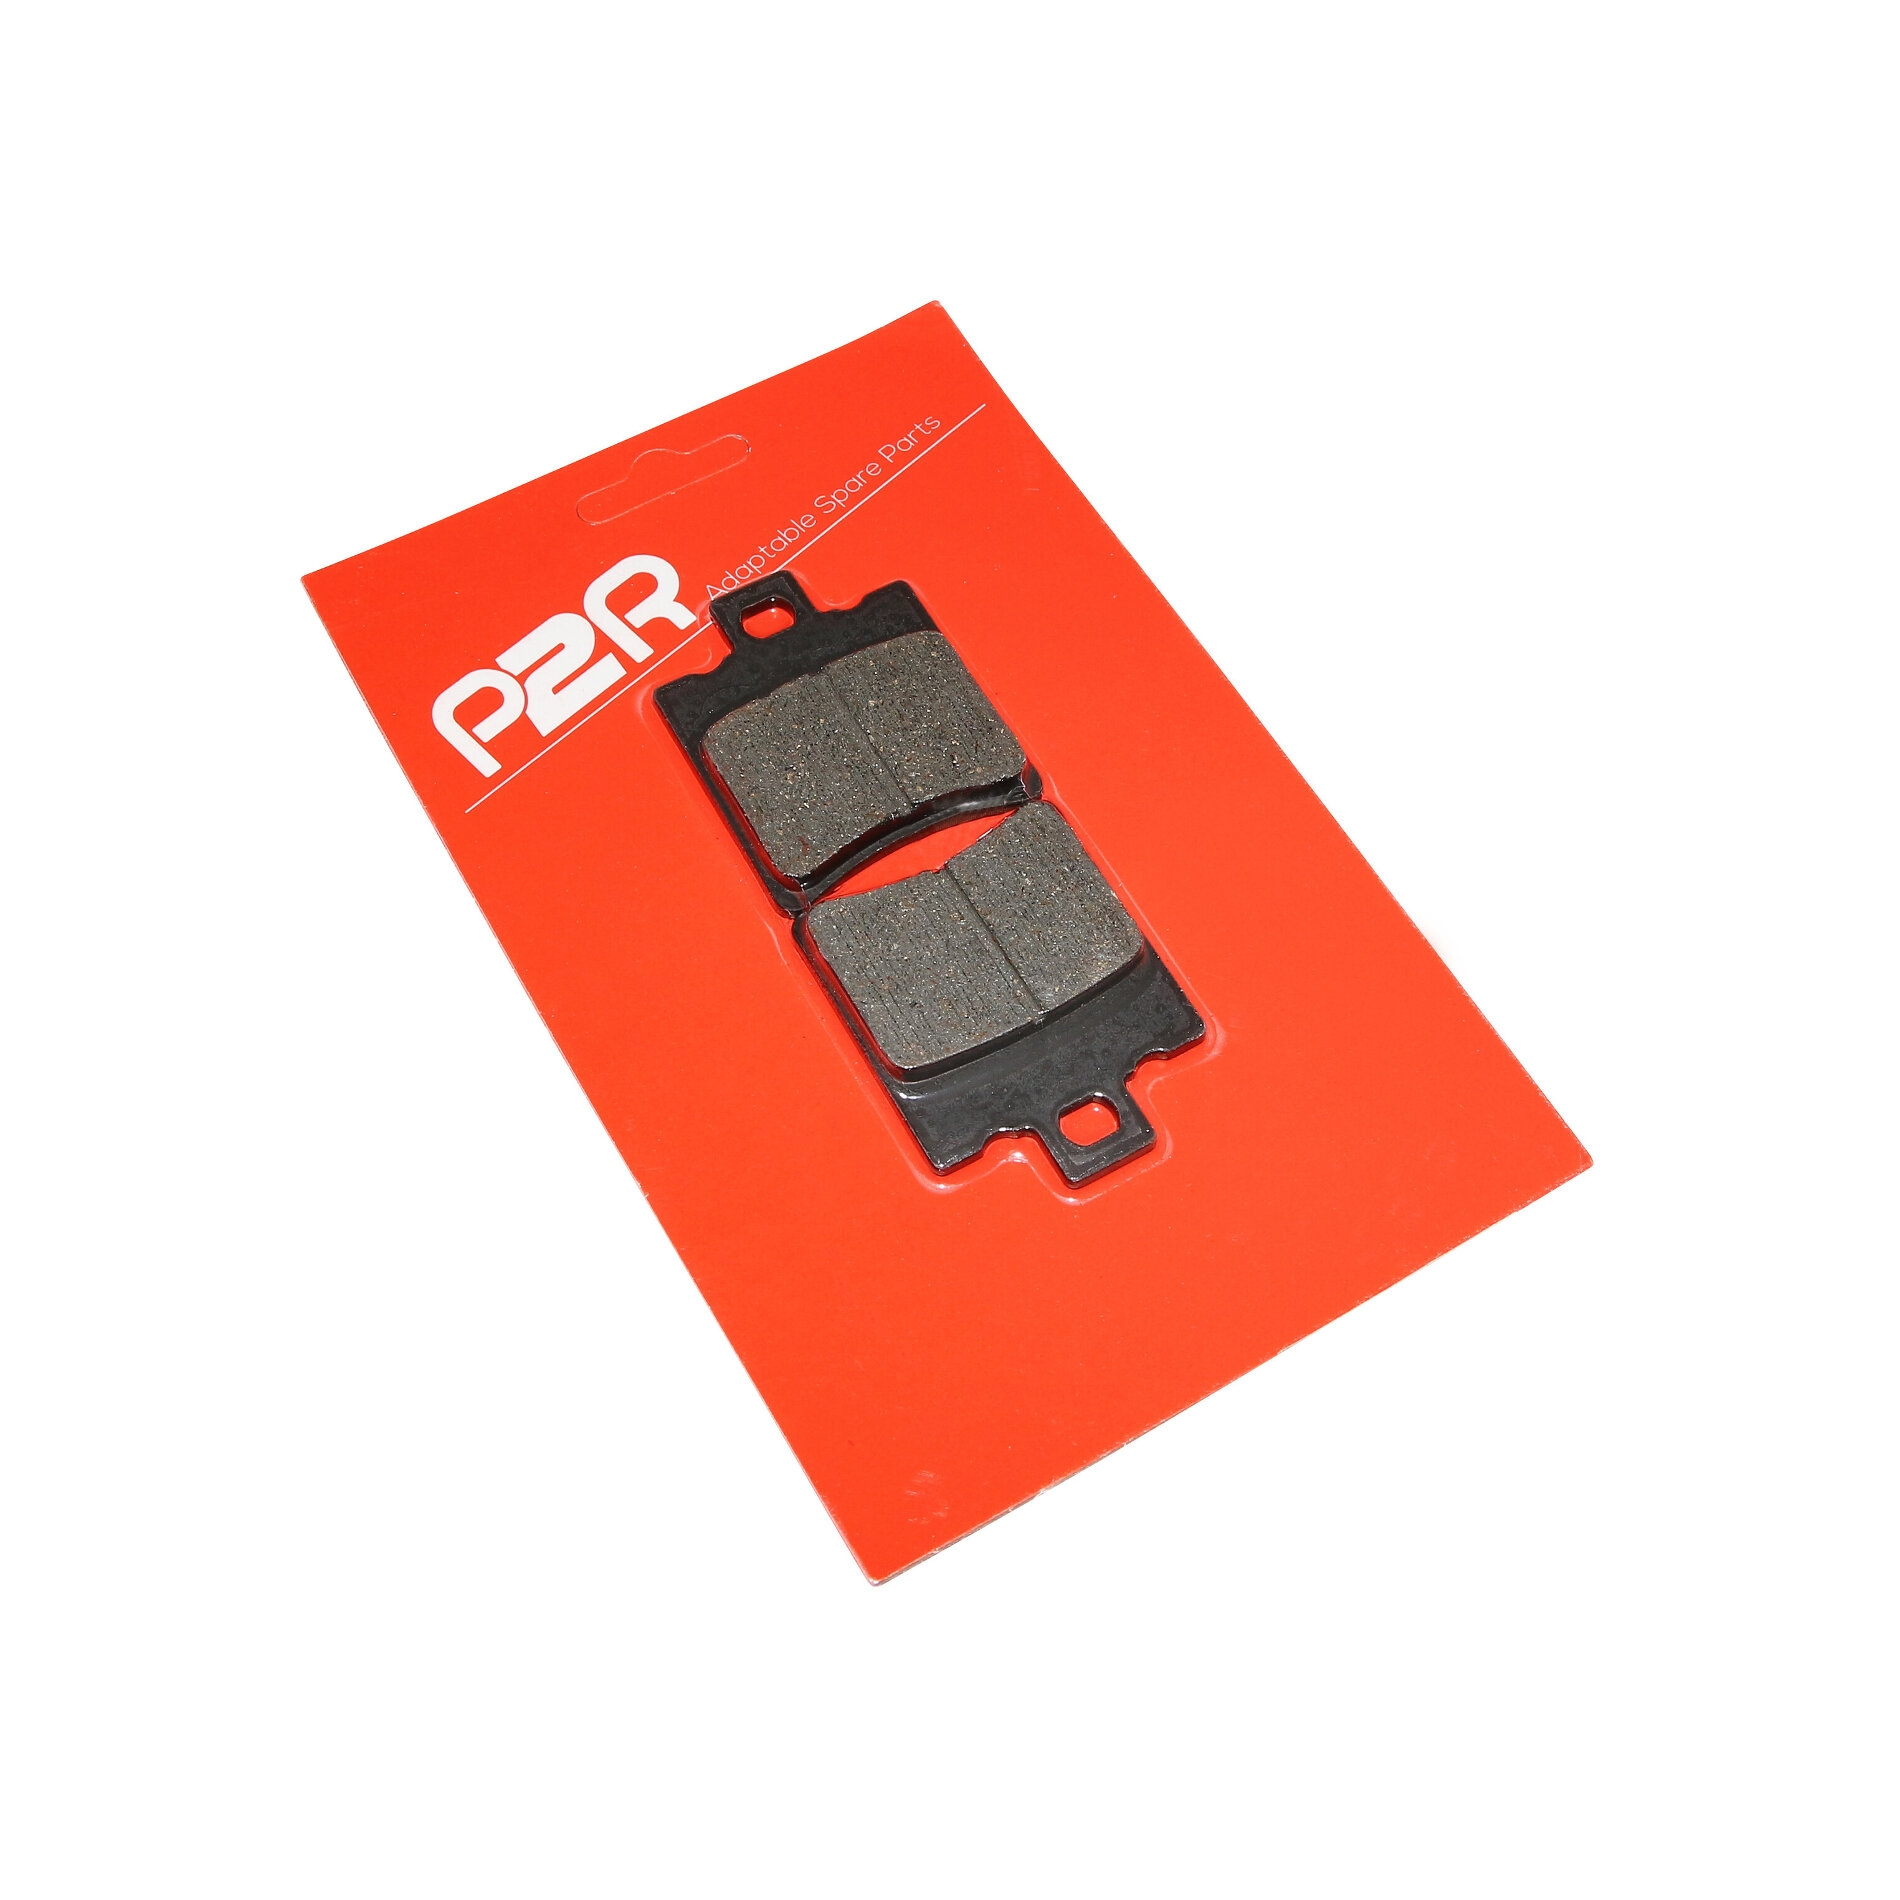 Plaquettes de frein avant adaptable MBK Booster/Nitro/Aprilia sr/malag